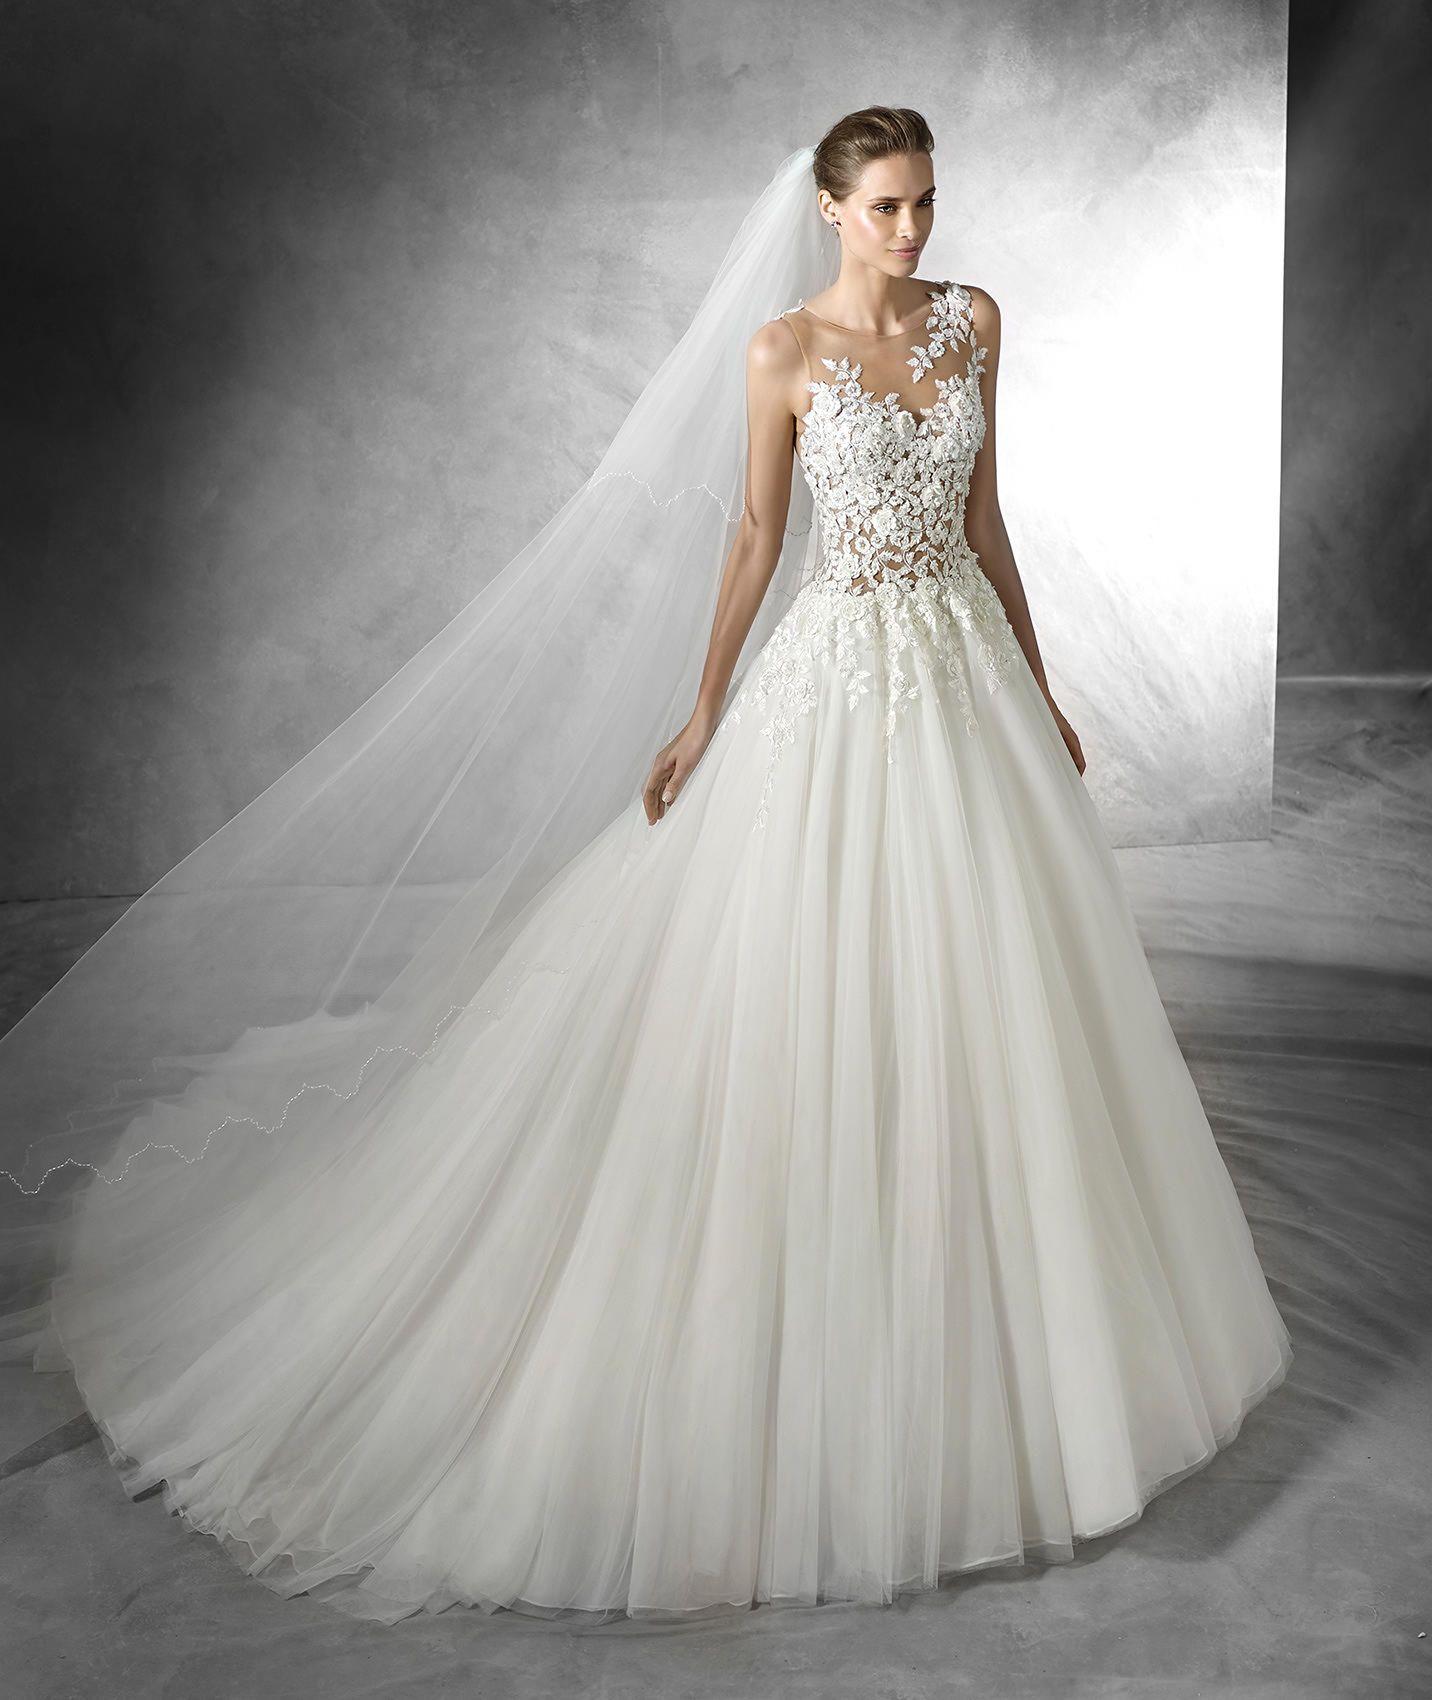 TACIANA- Sexy Brautkleid im Prinzessin-Stil e52e77b31f2